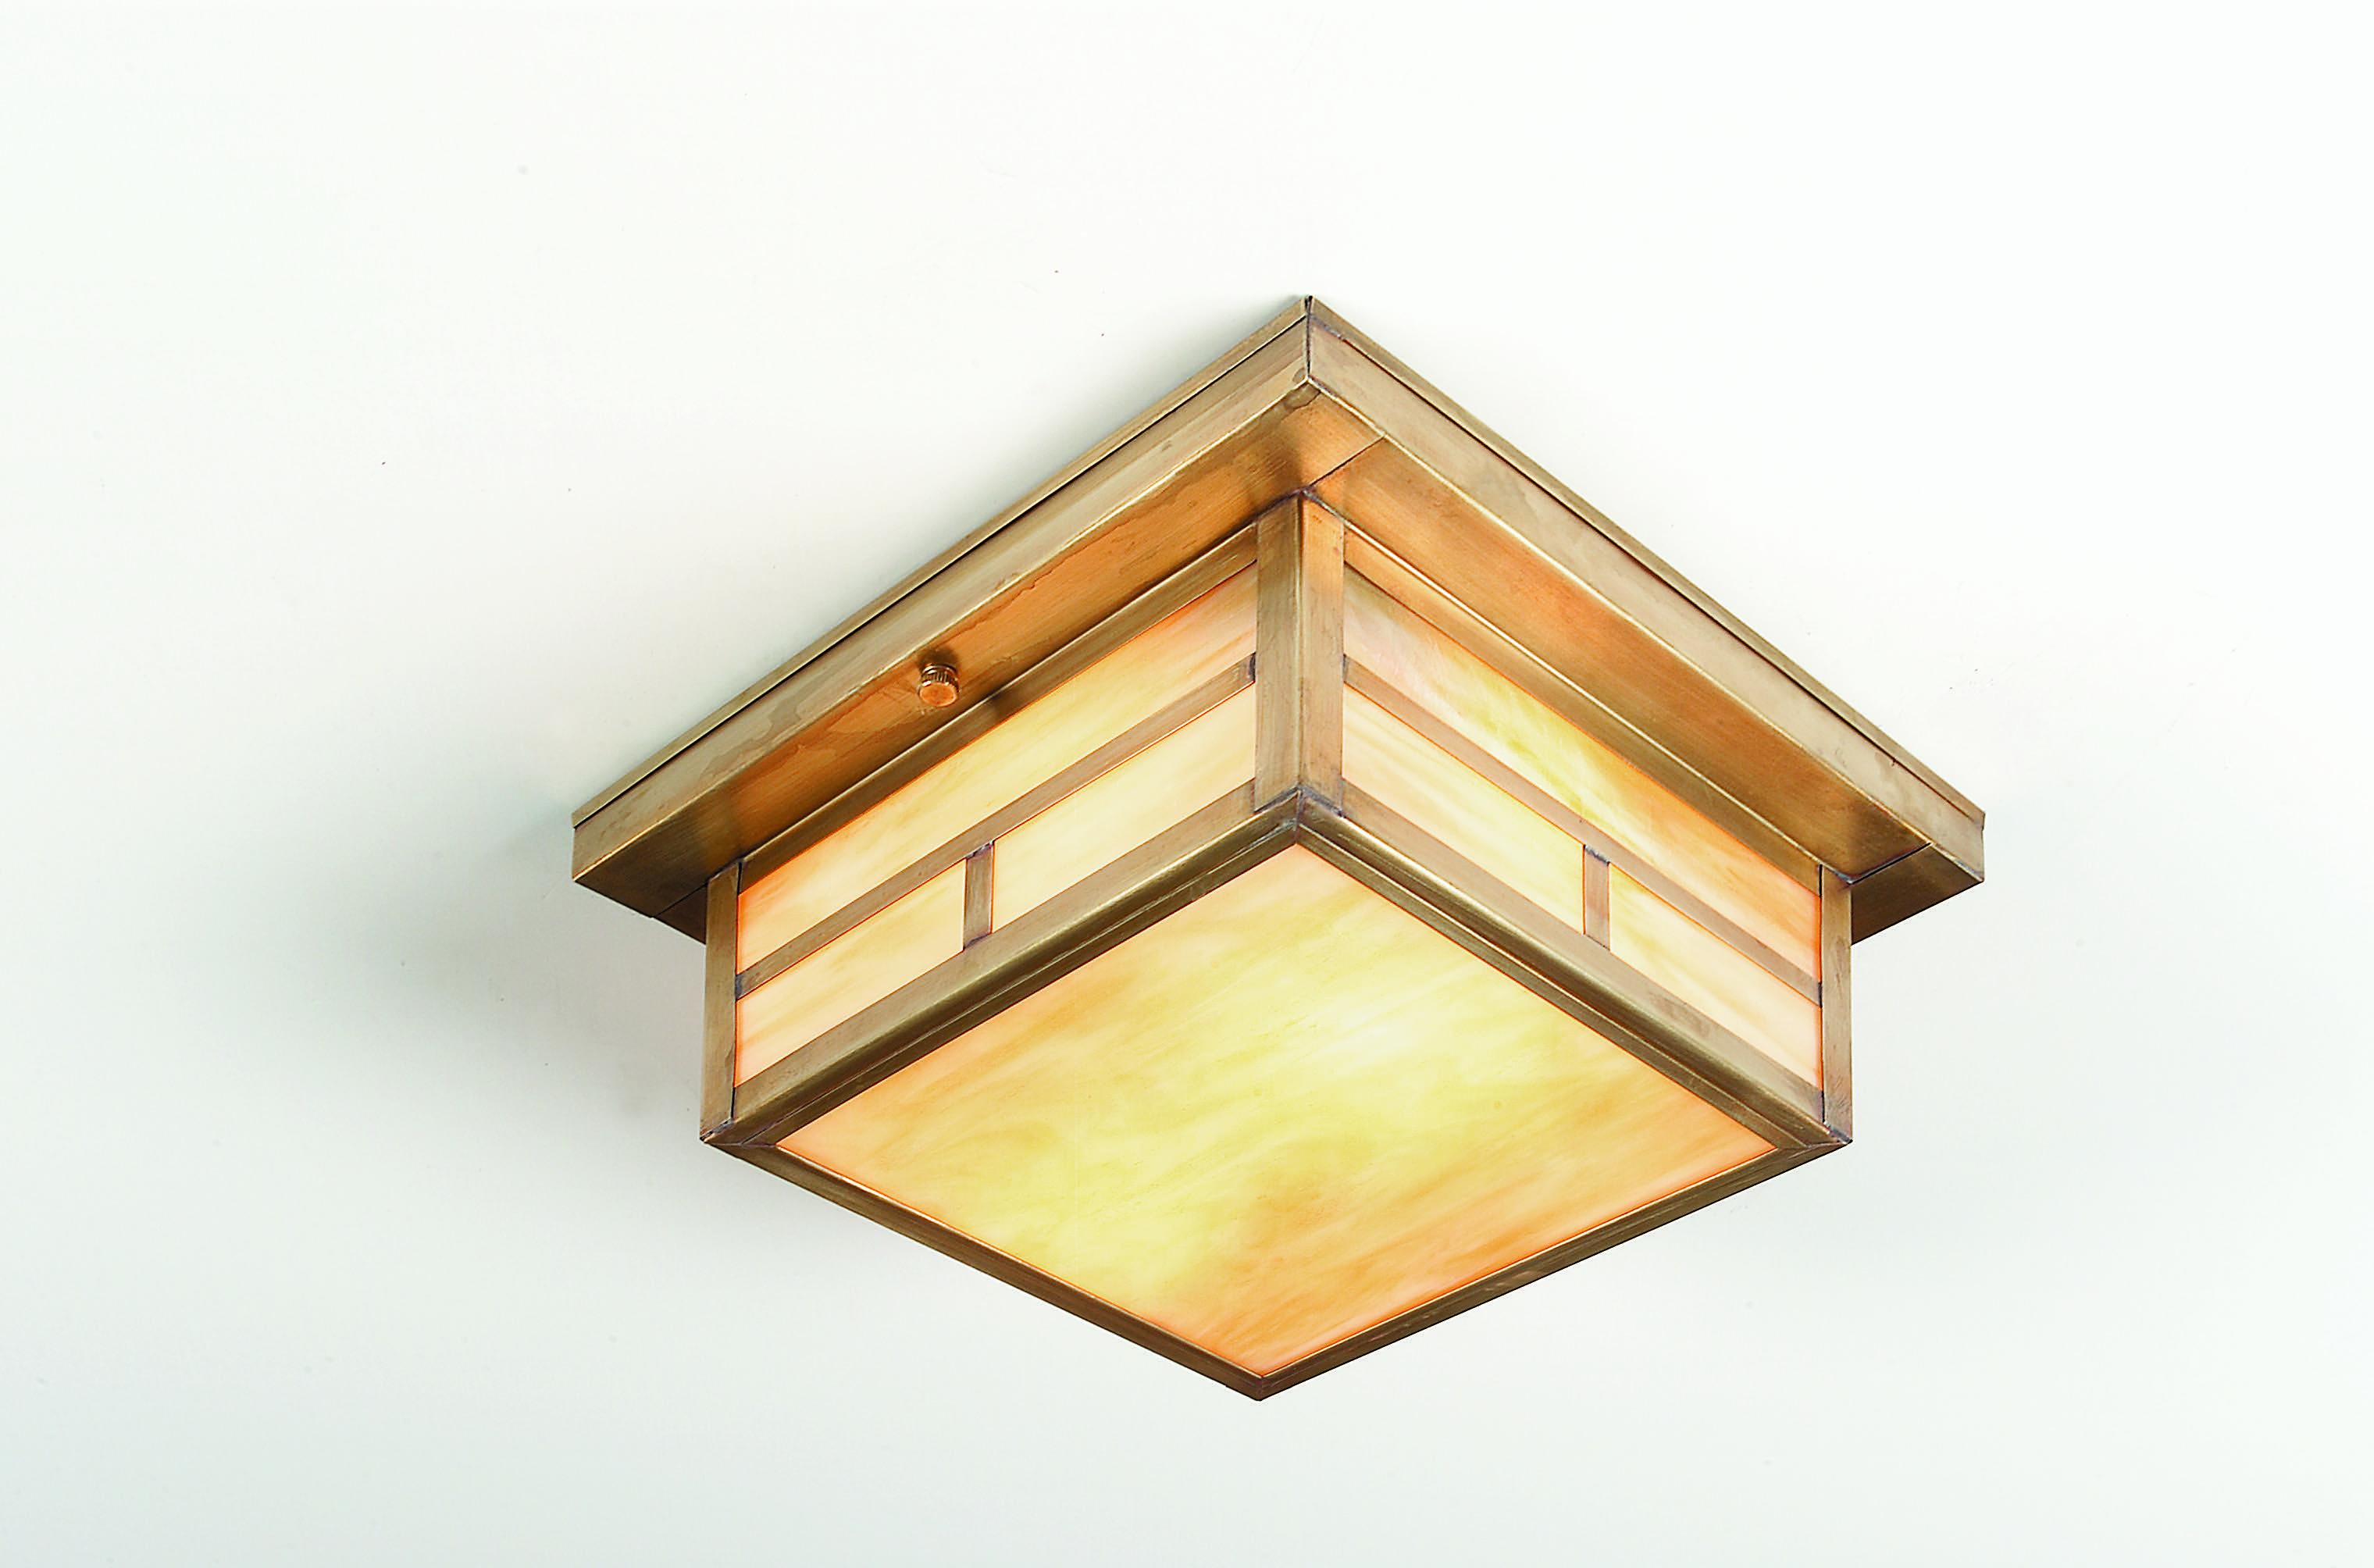 Craftsman Style Ceiling Light & Lights   38 Yrs ...